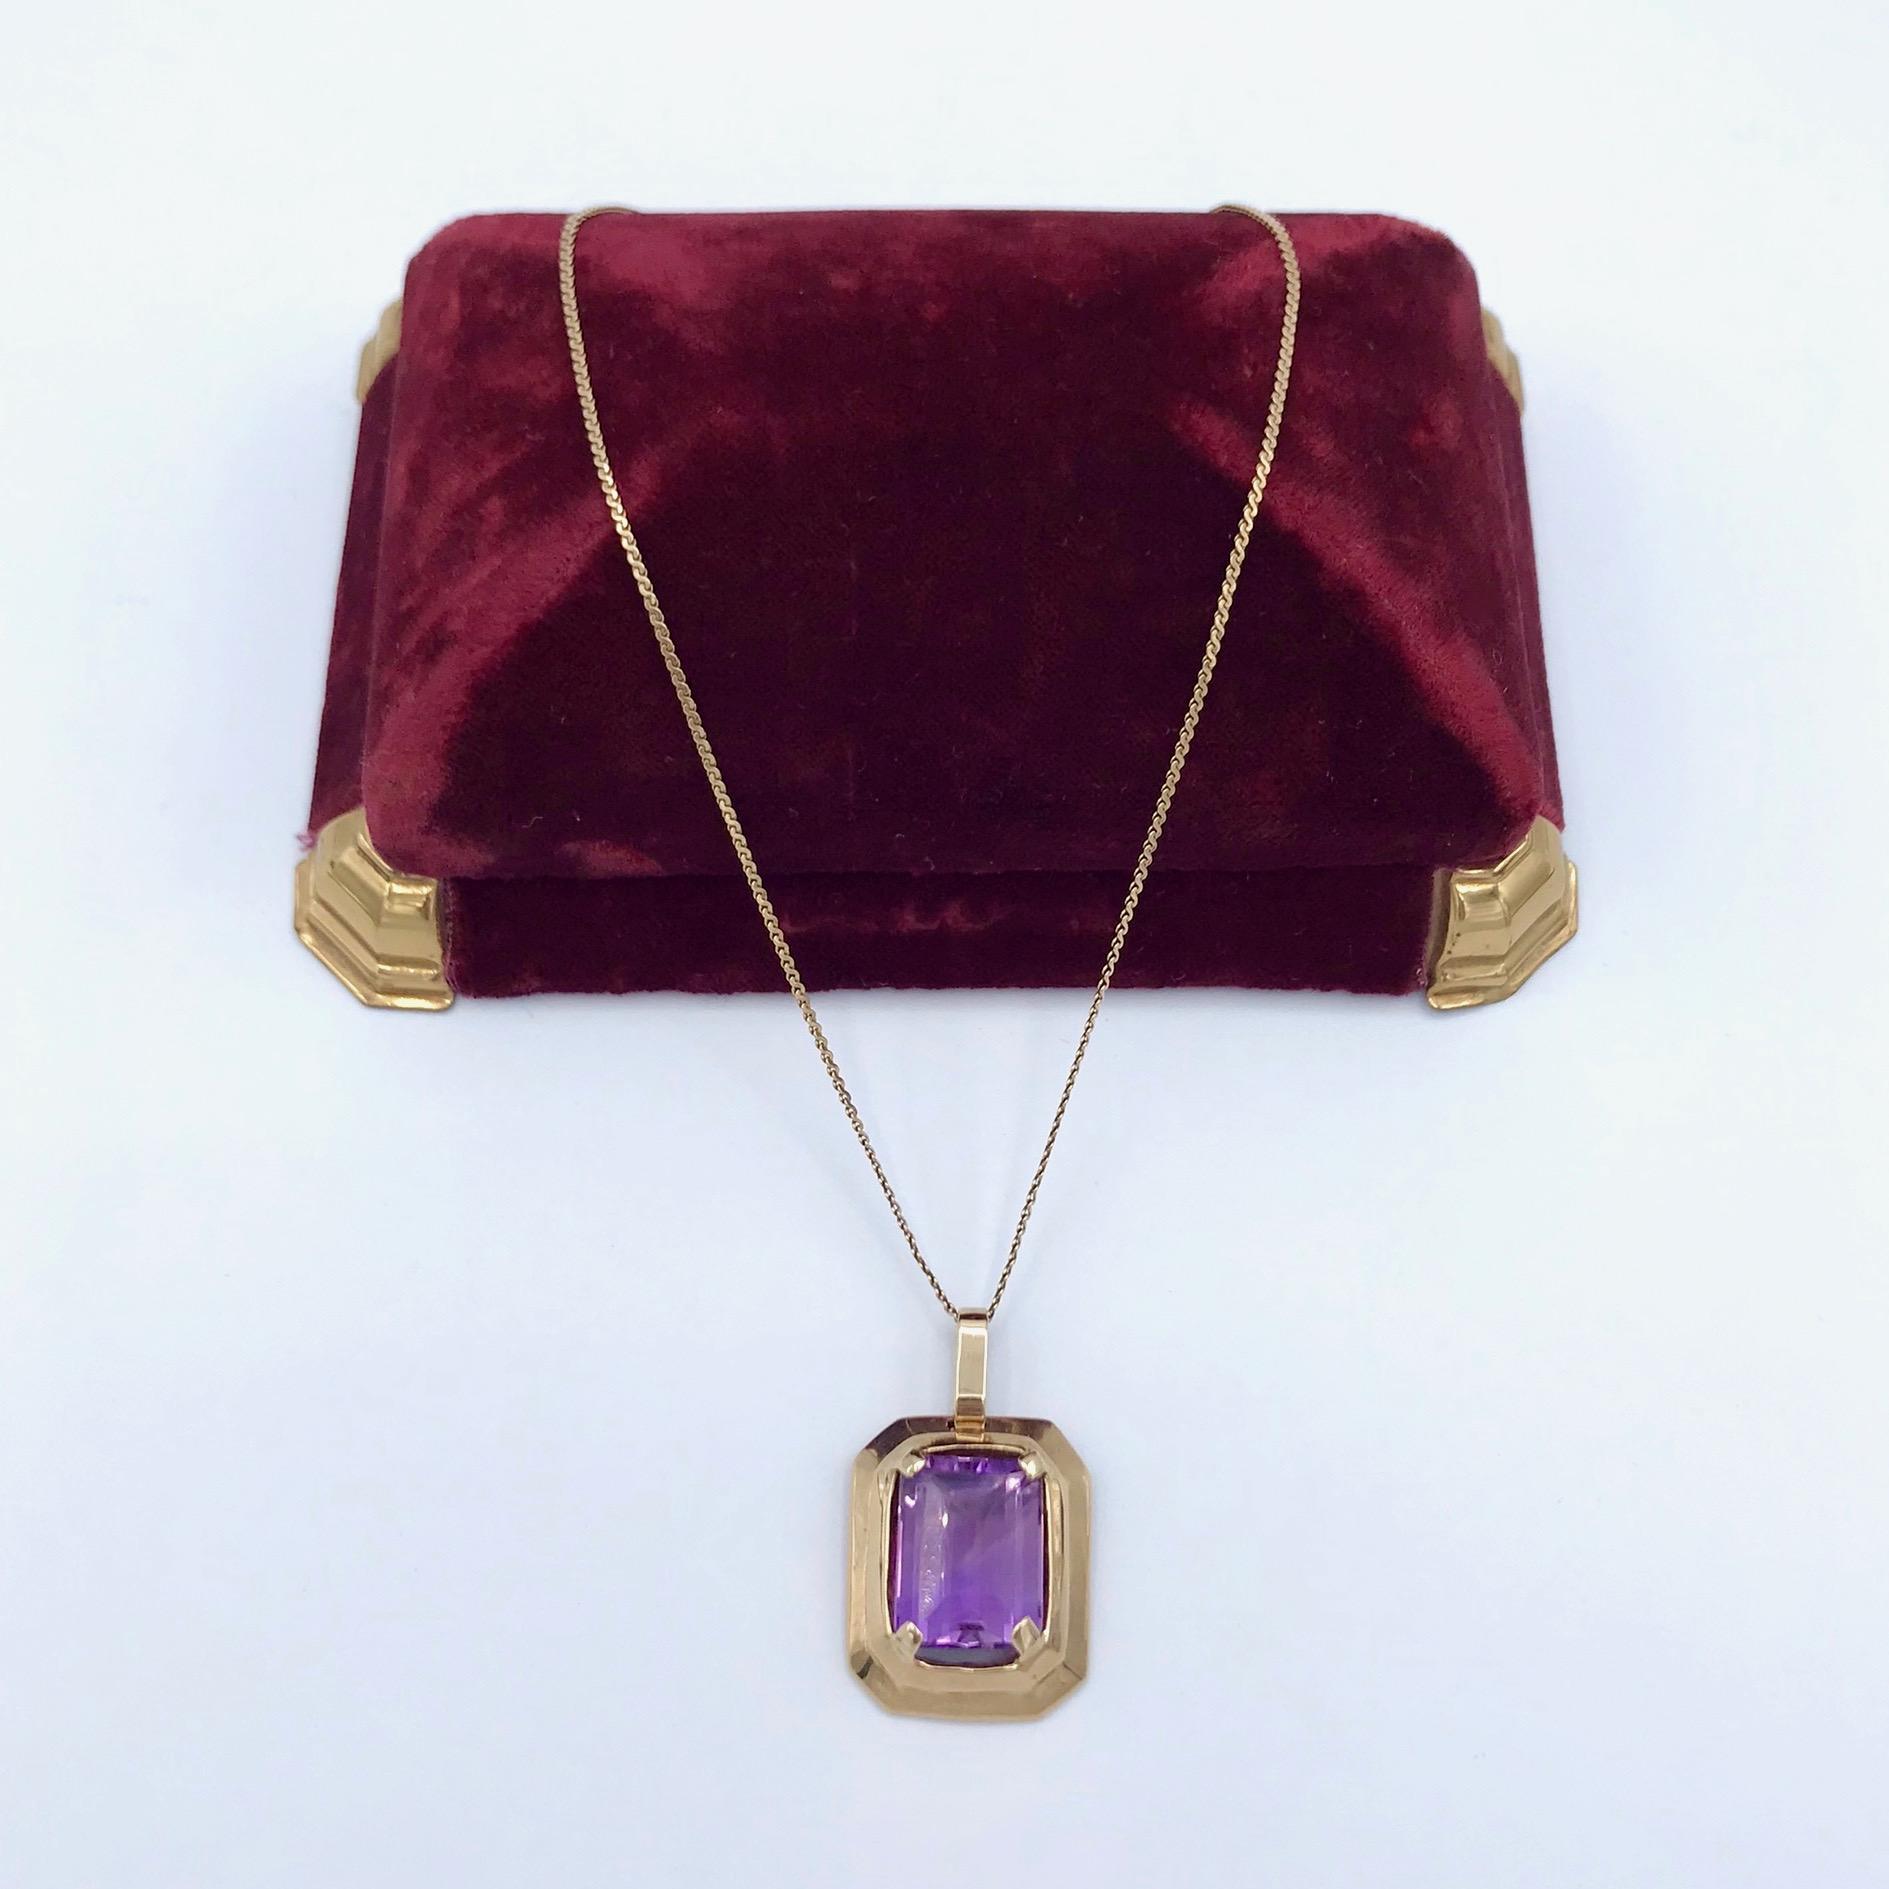 Rcctangular Gold & Amethyst Necklace